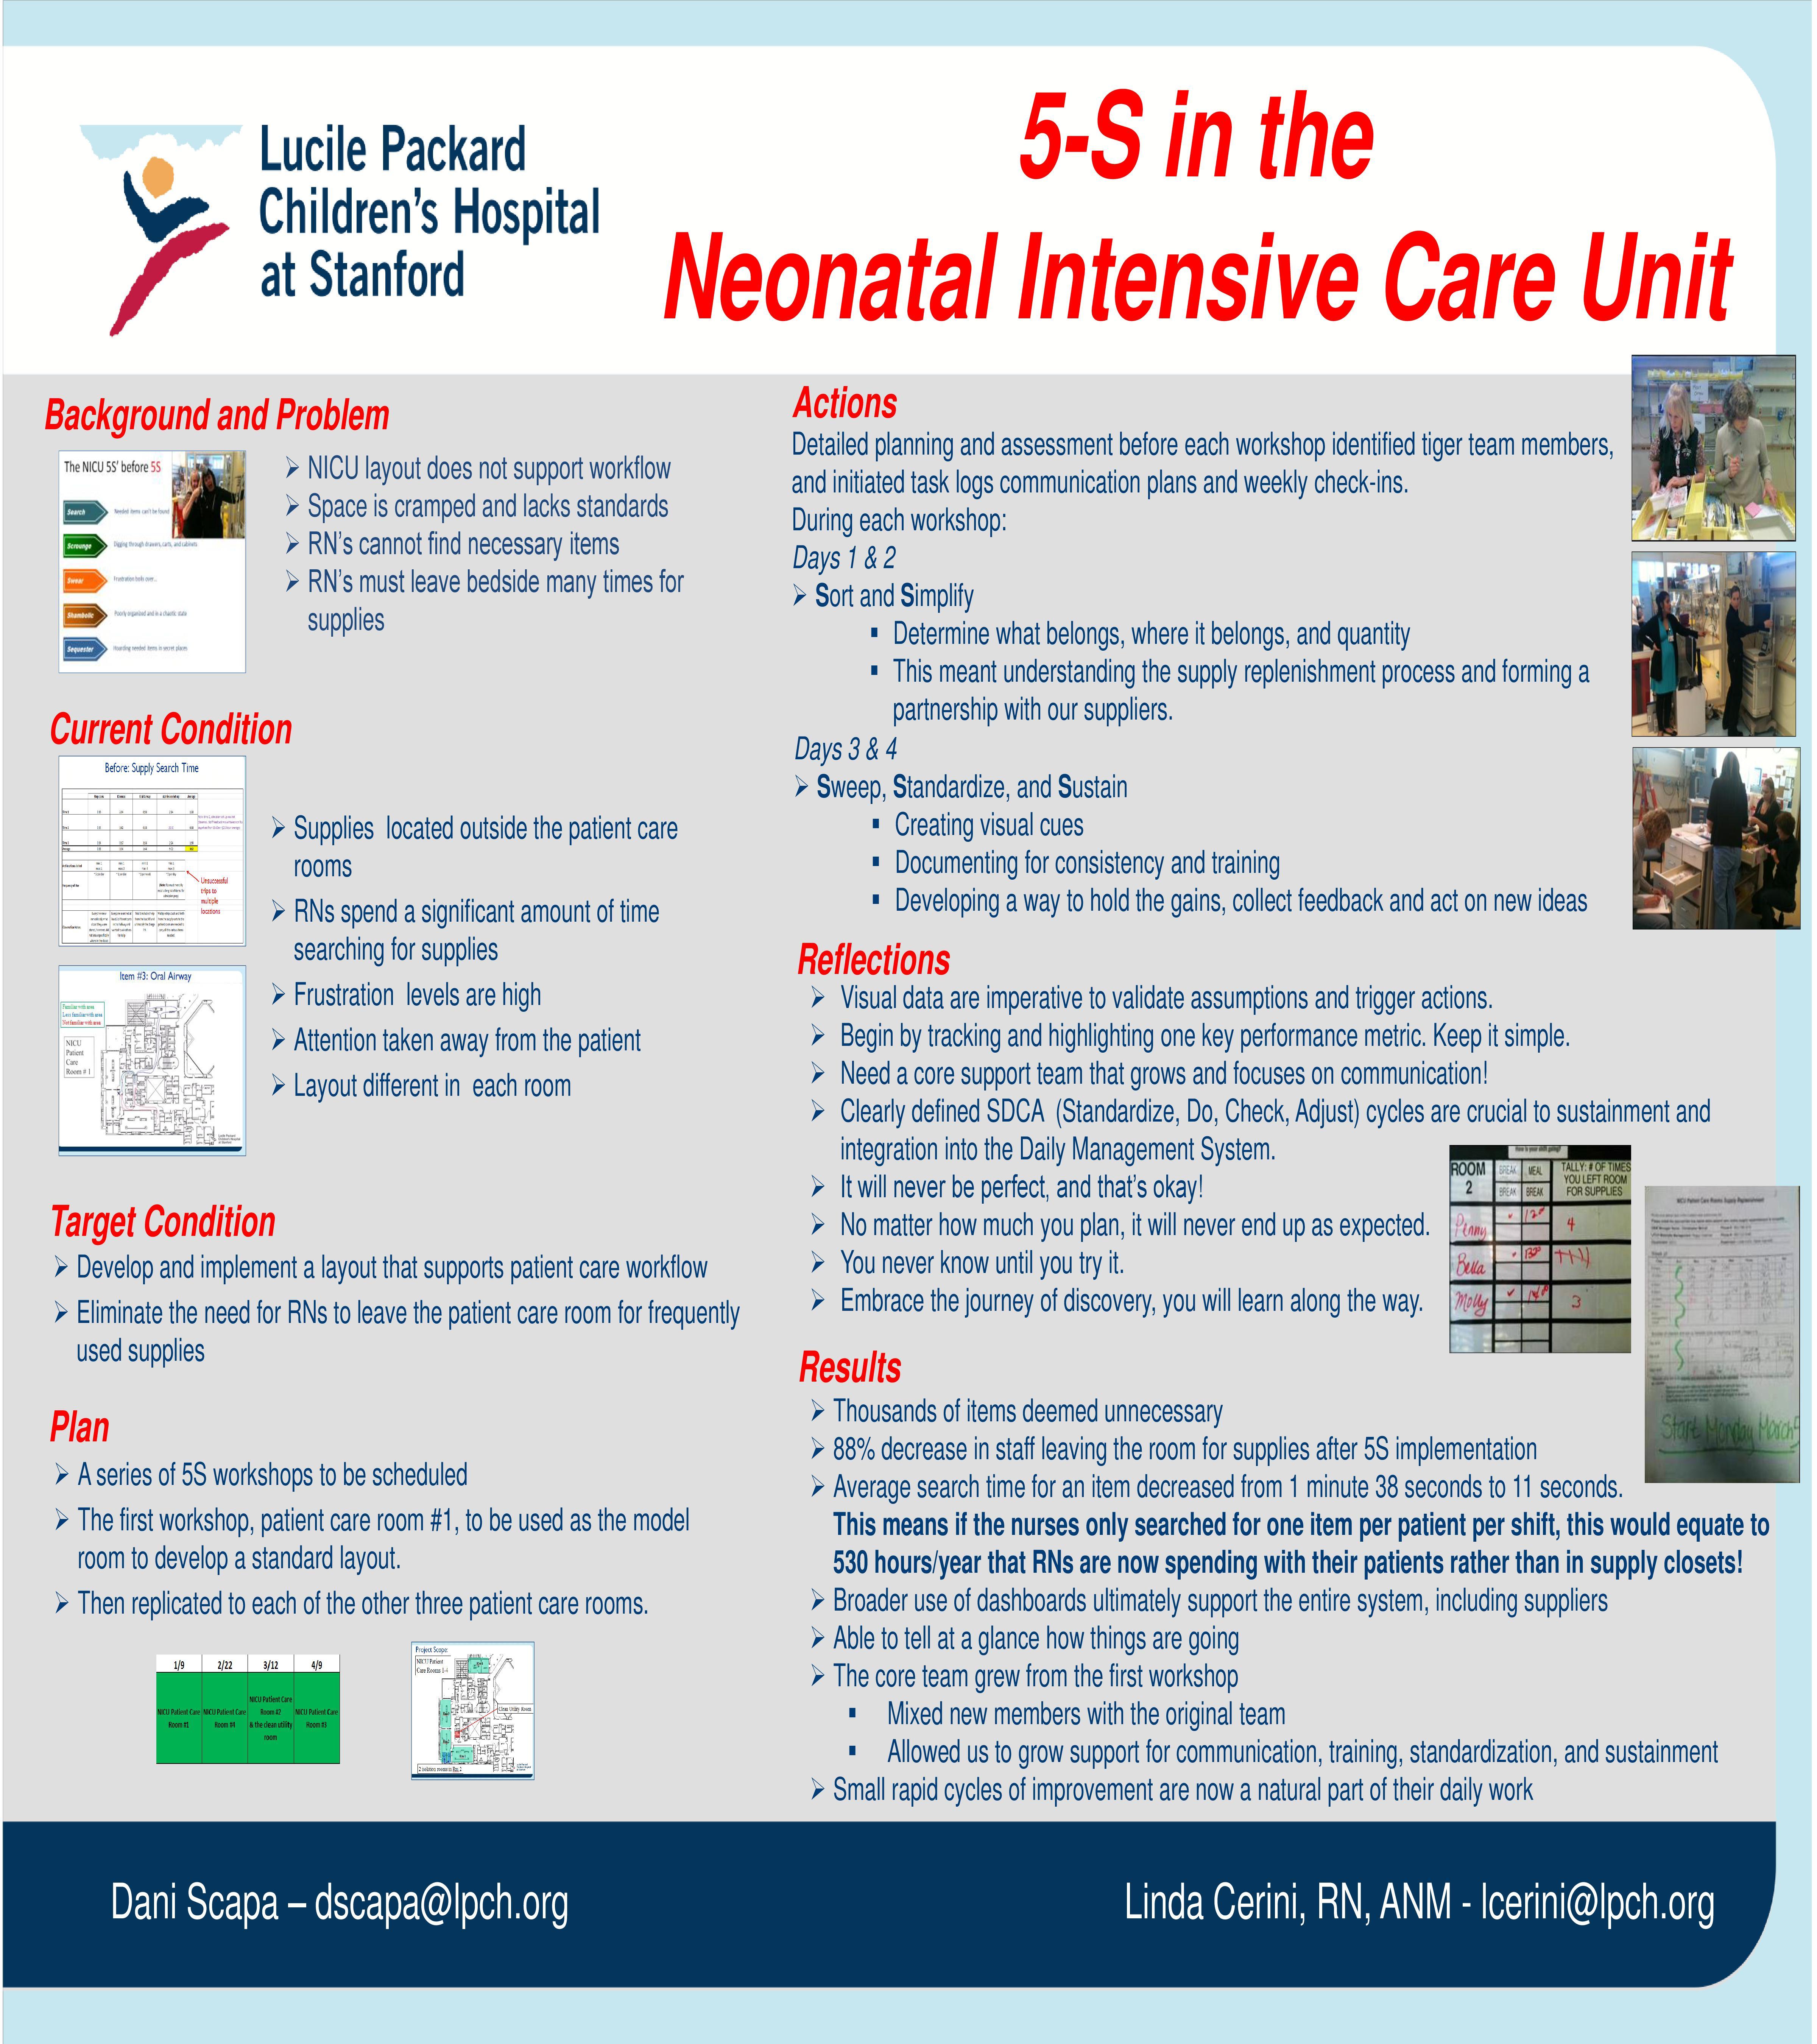 Nursing Home Design Standards Uk: Institute For Healthcare Improvement :Offering View